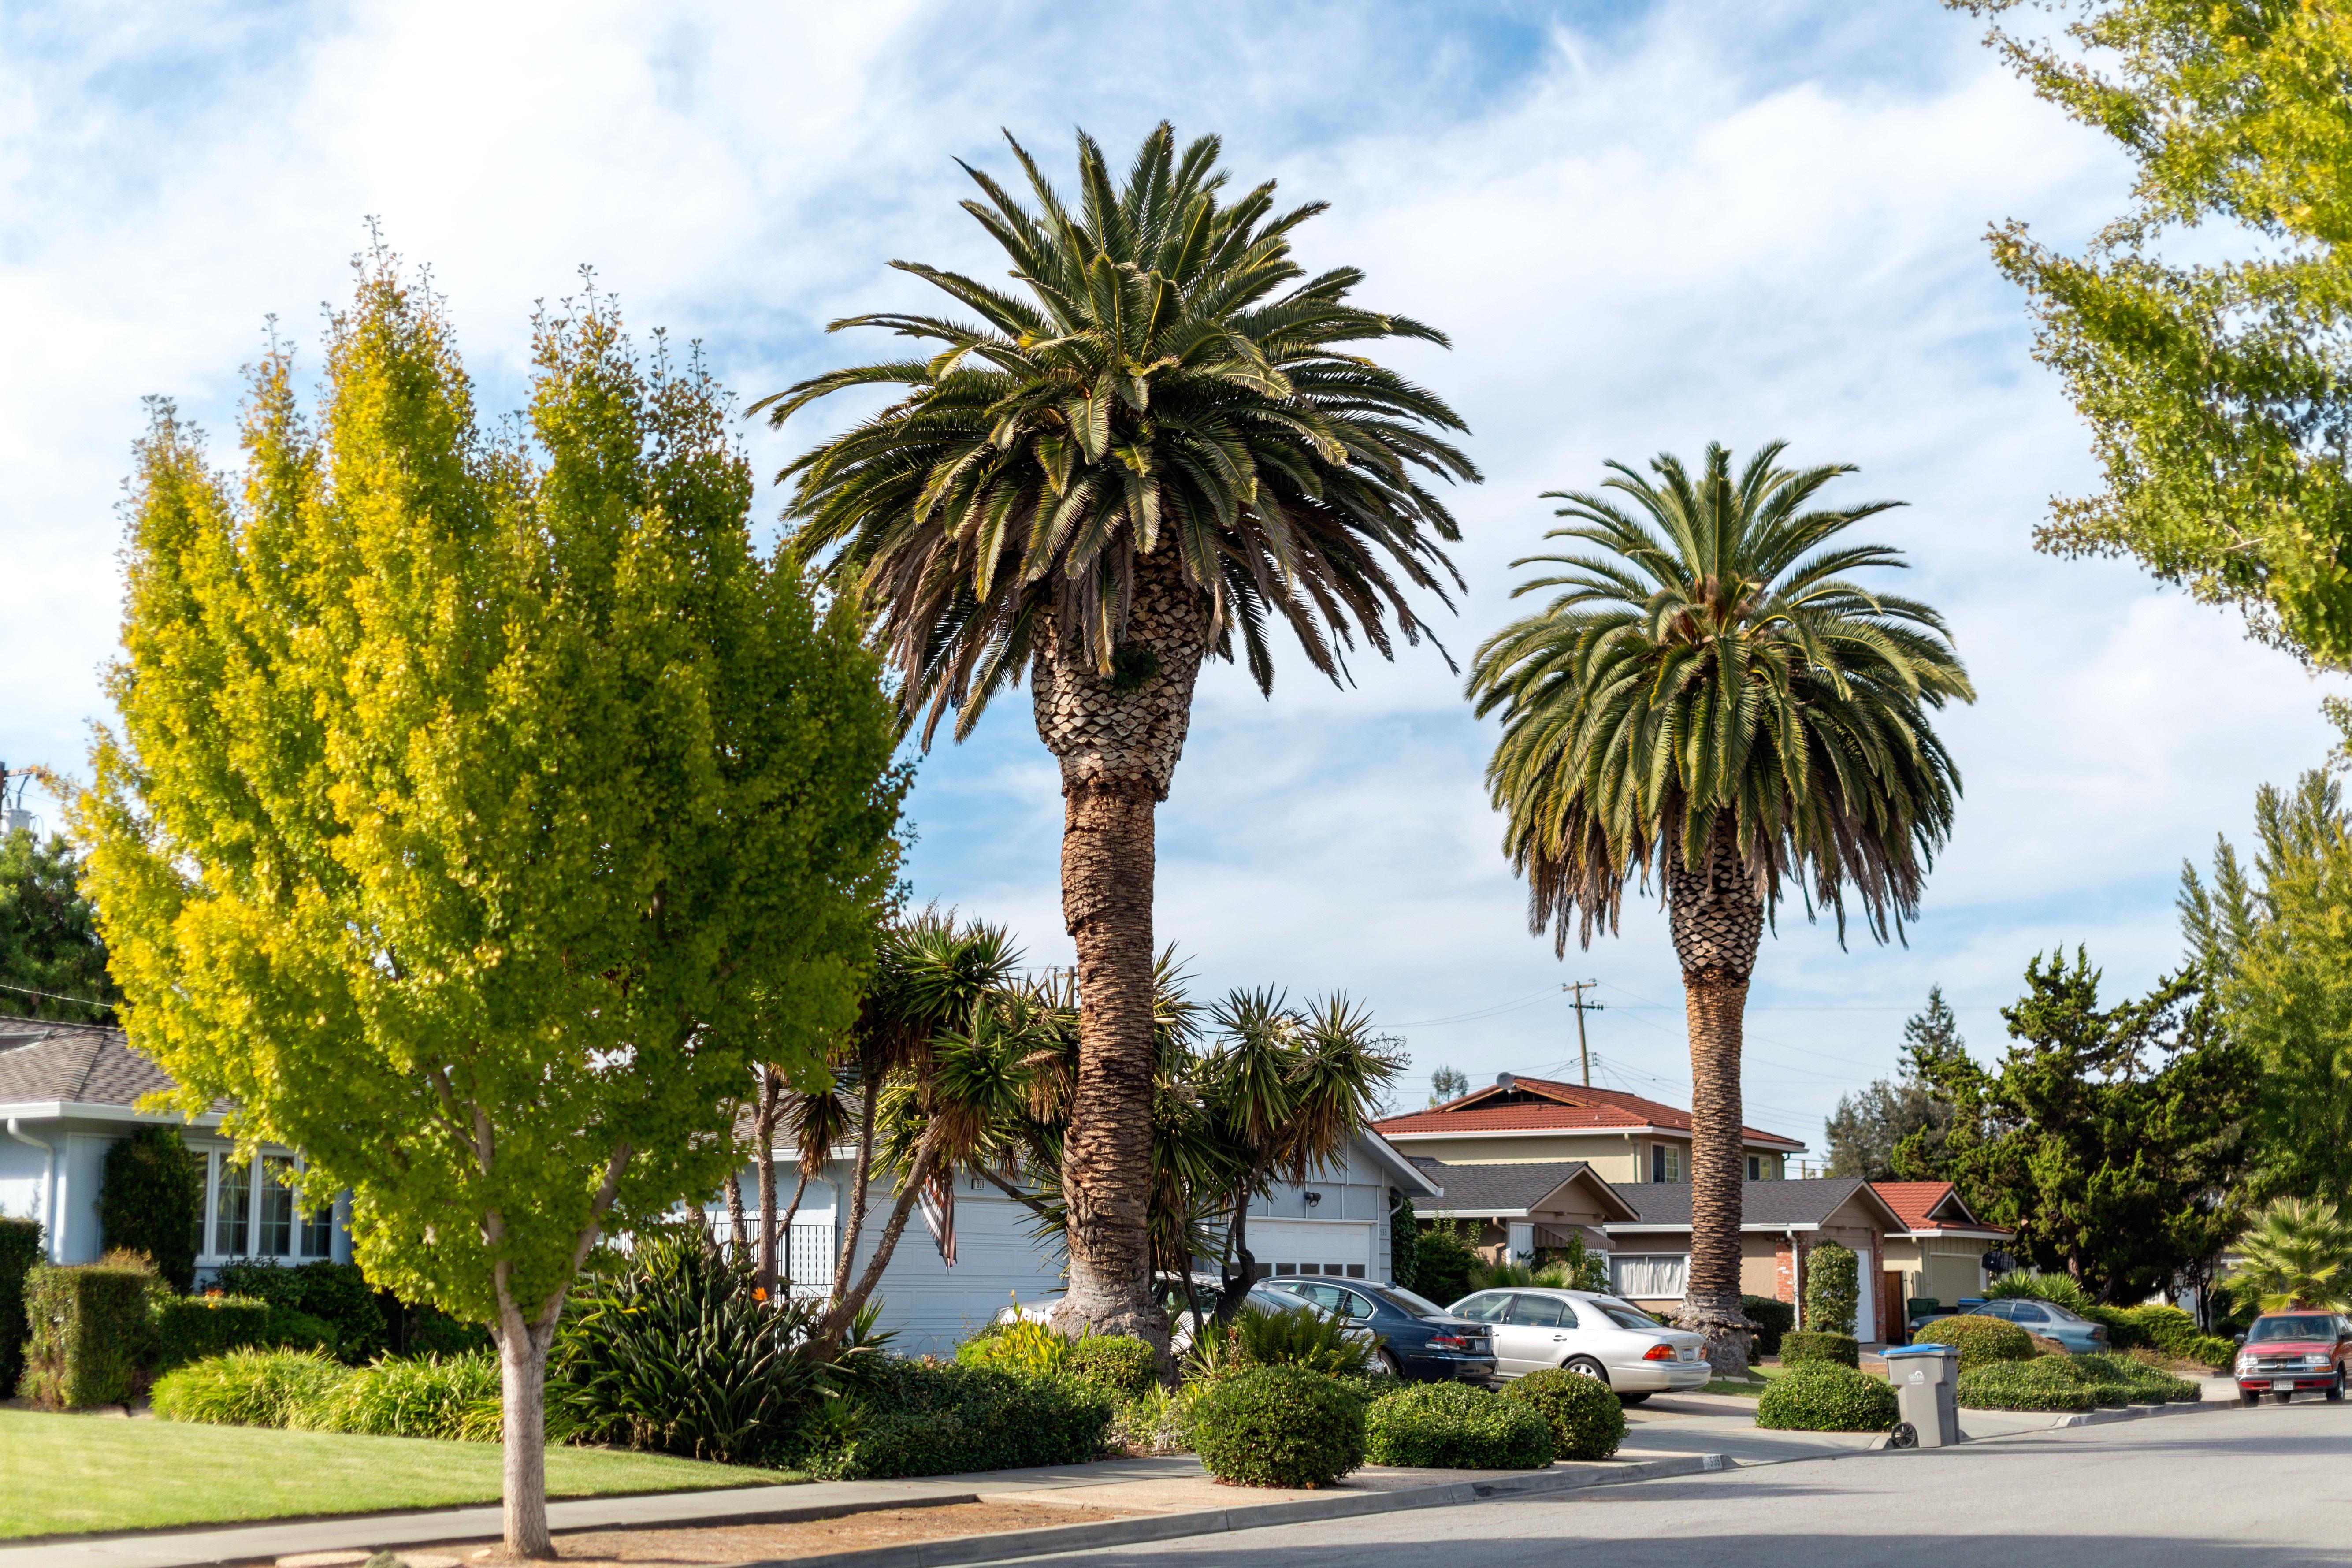 Residential neighborhood in San Jose, California